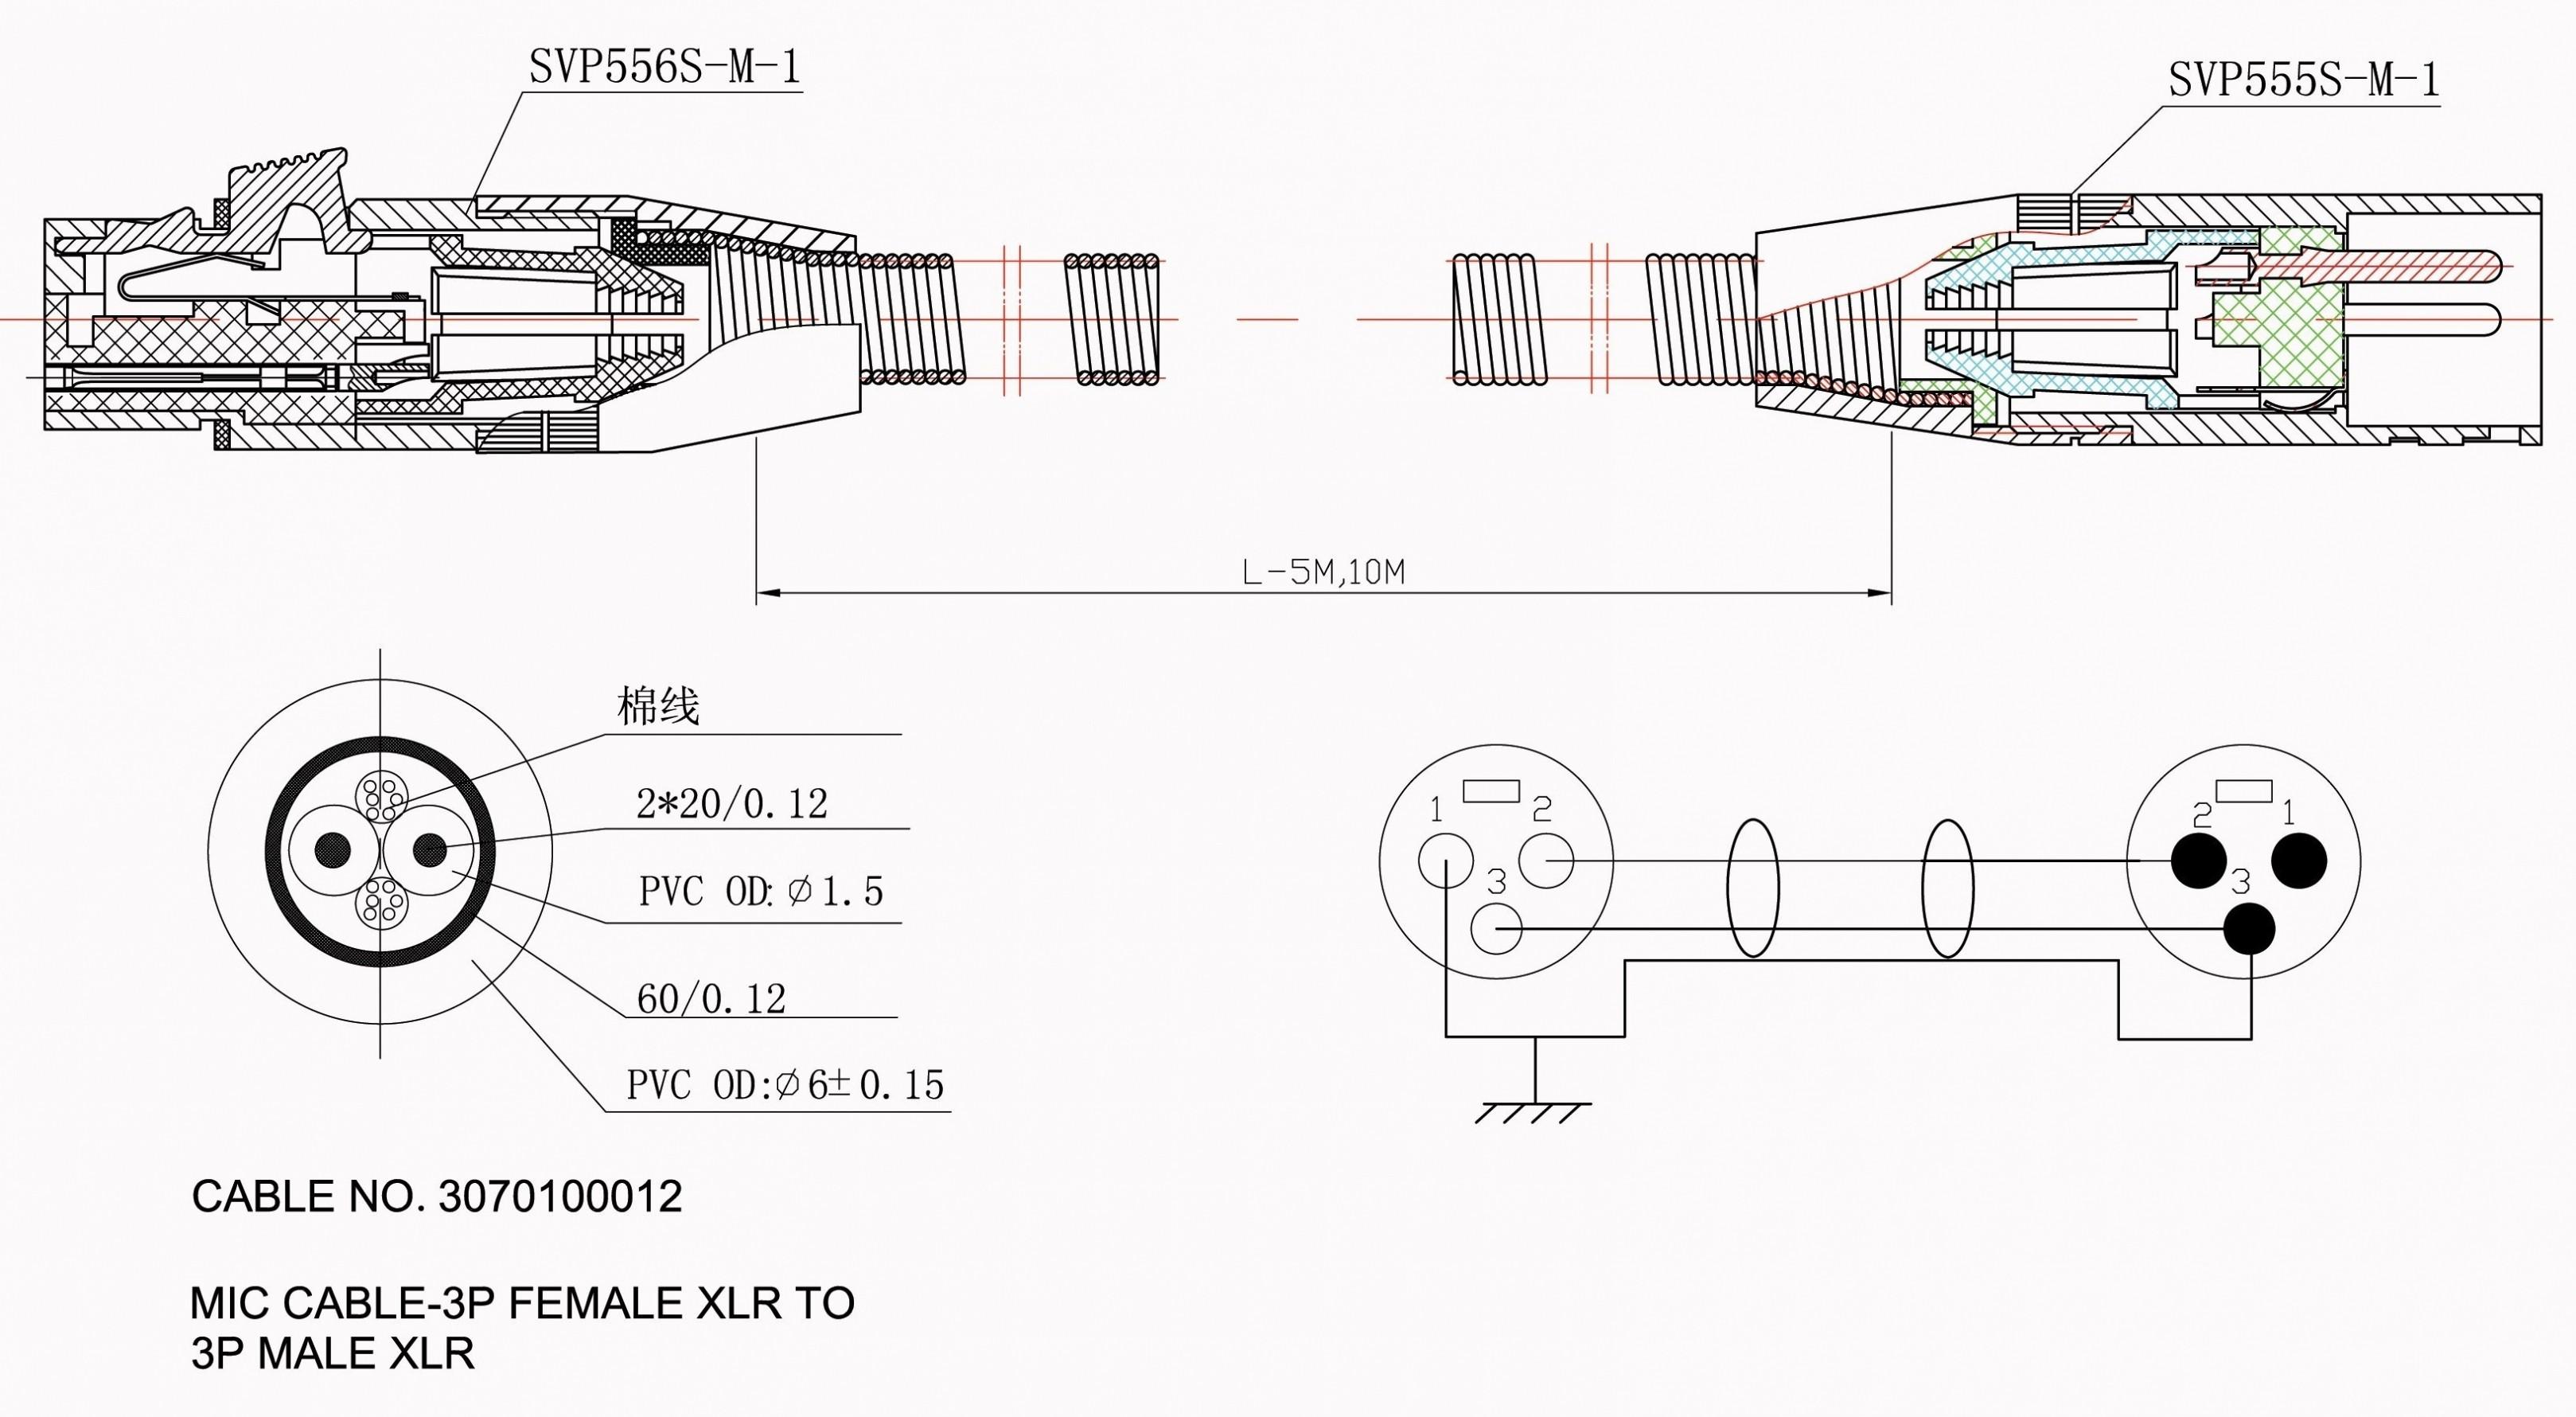 Brake Light Wire Diagram Audi A4 Tail Light Wiring Diagram Inspirationa Wiring Diagram Tail Of Brake Light Wire Diagram